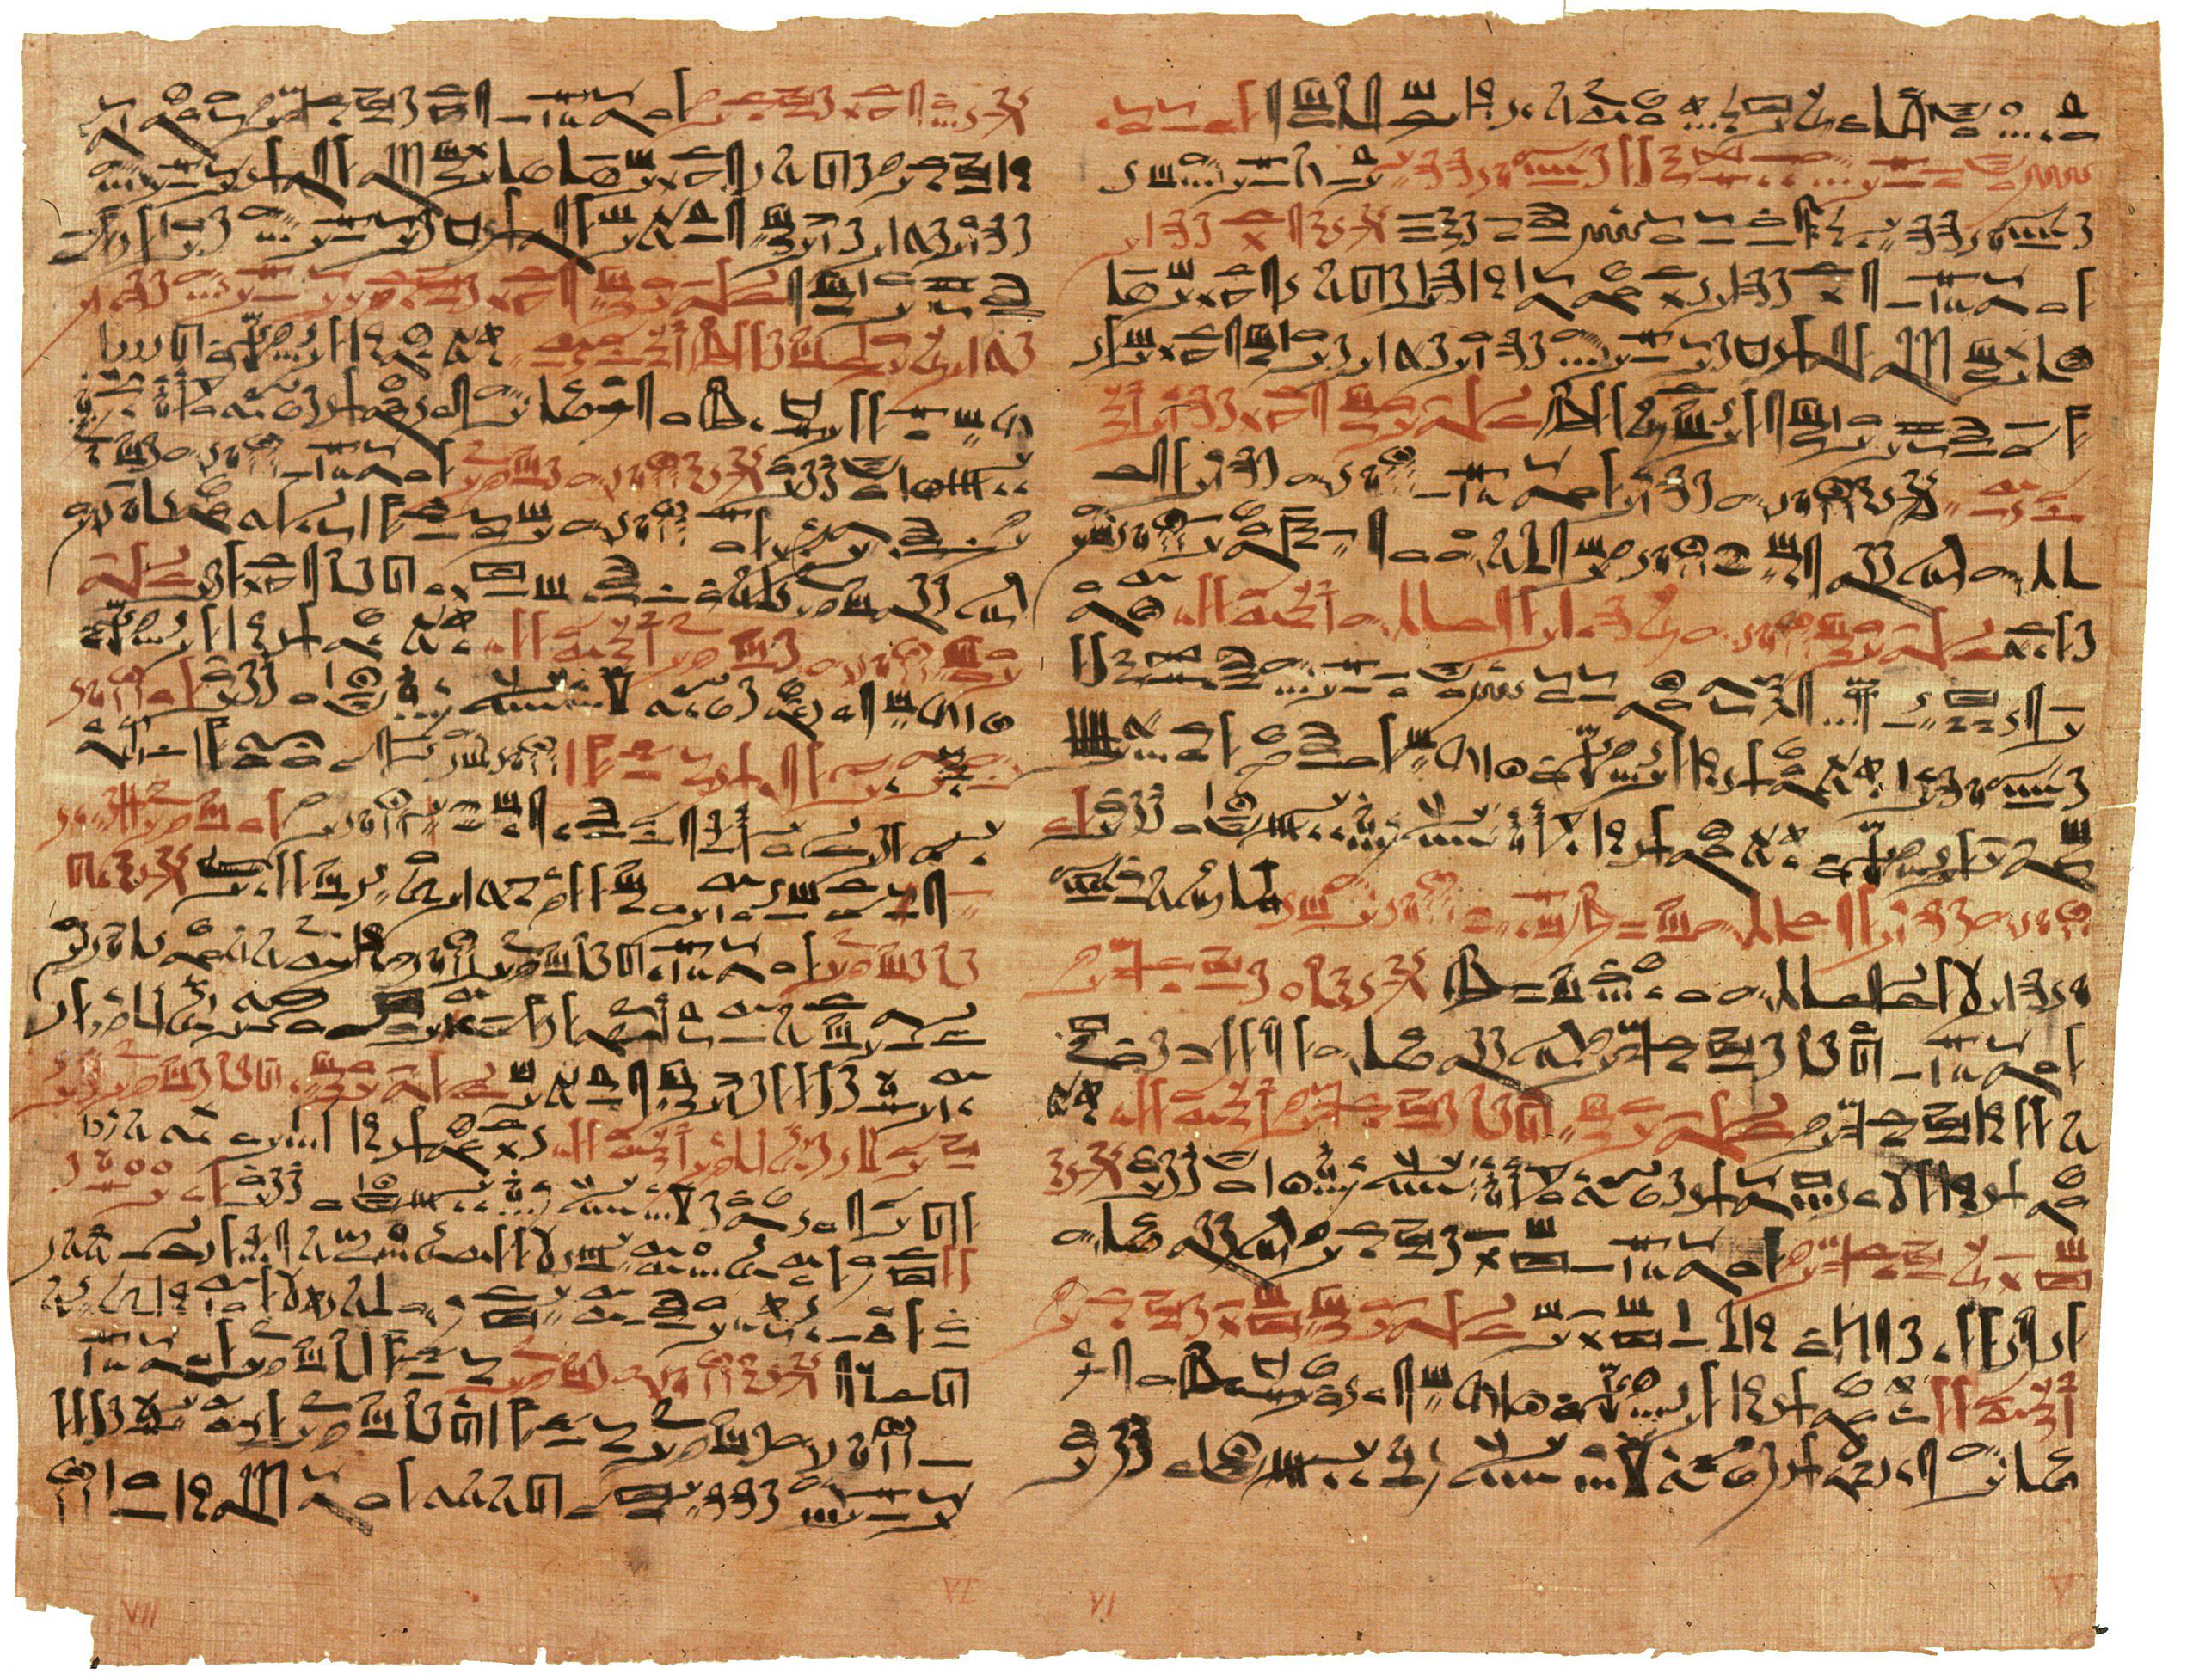 Edwin_Smith_Papyrus_v2.jpg